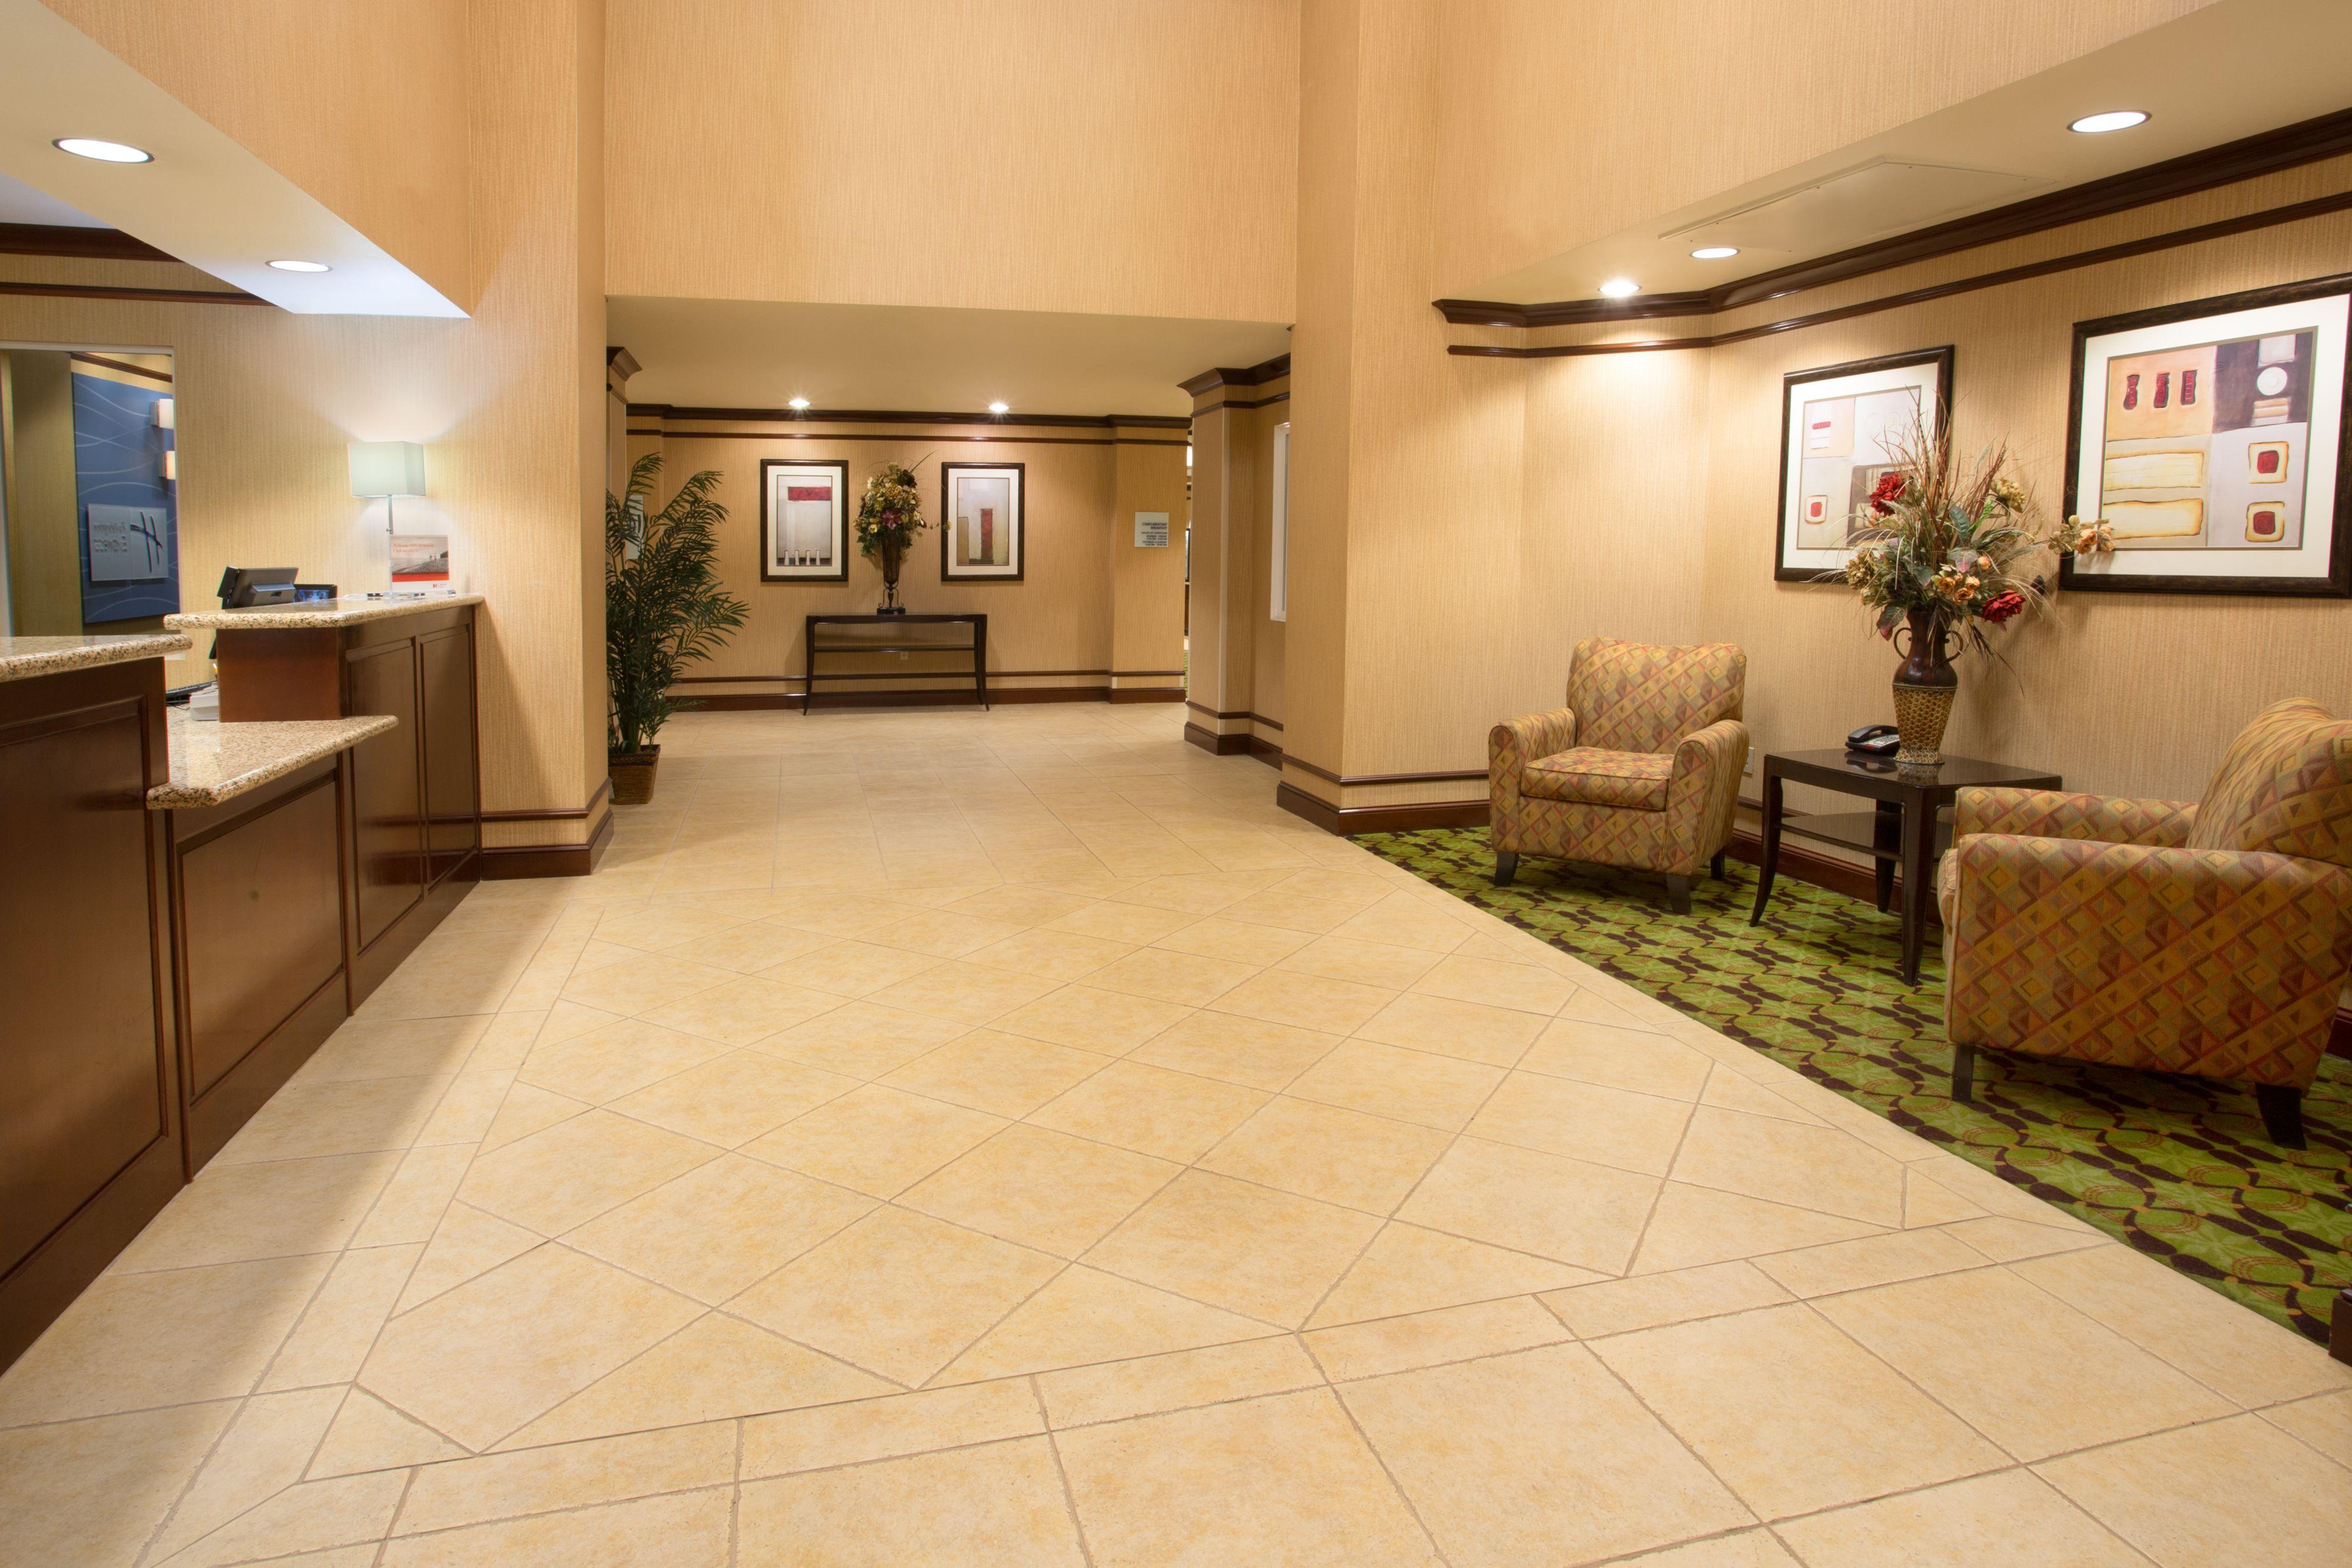 Holiday Inn Express Yreka-Shasta Area image 5